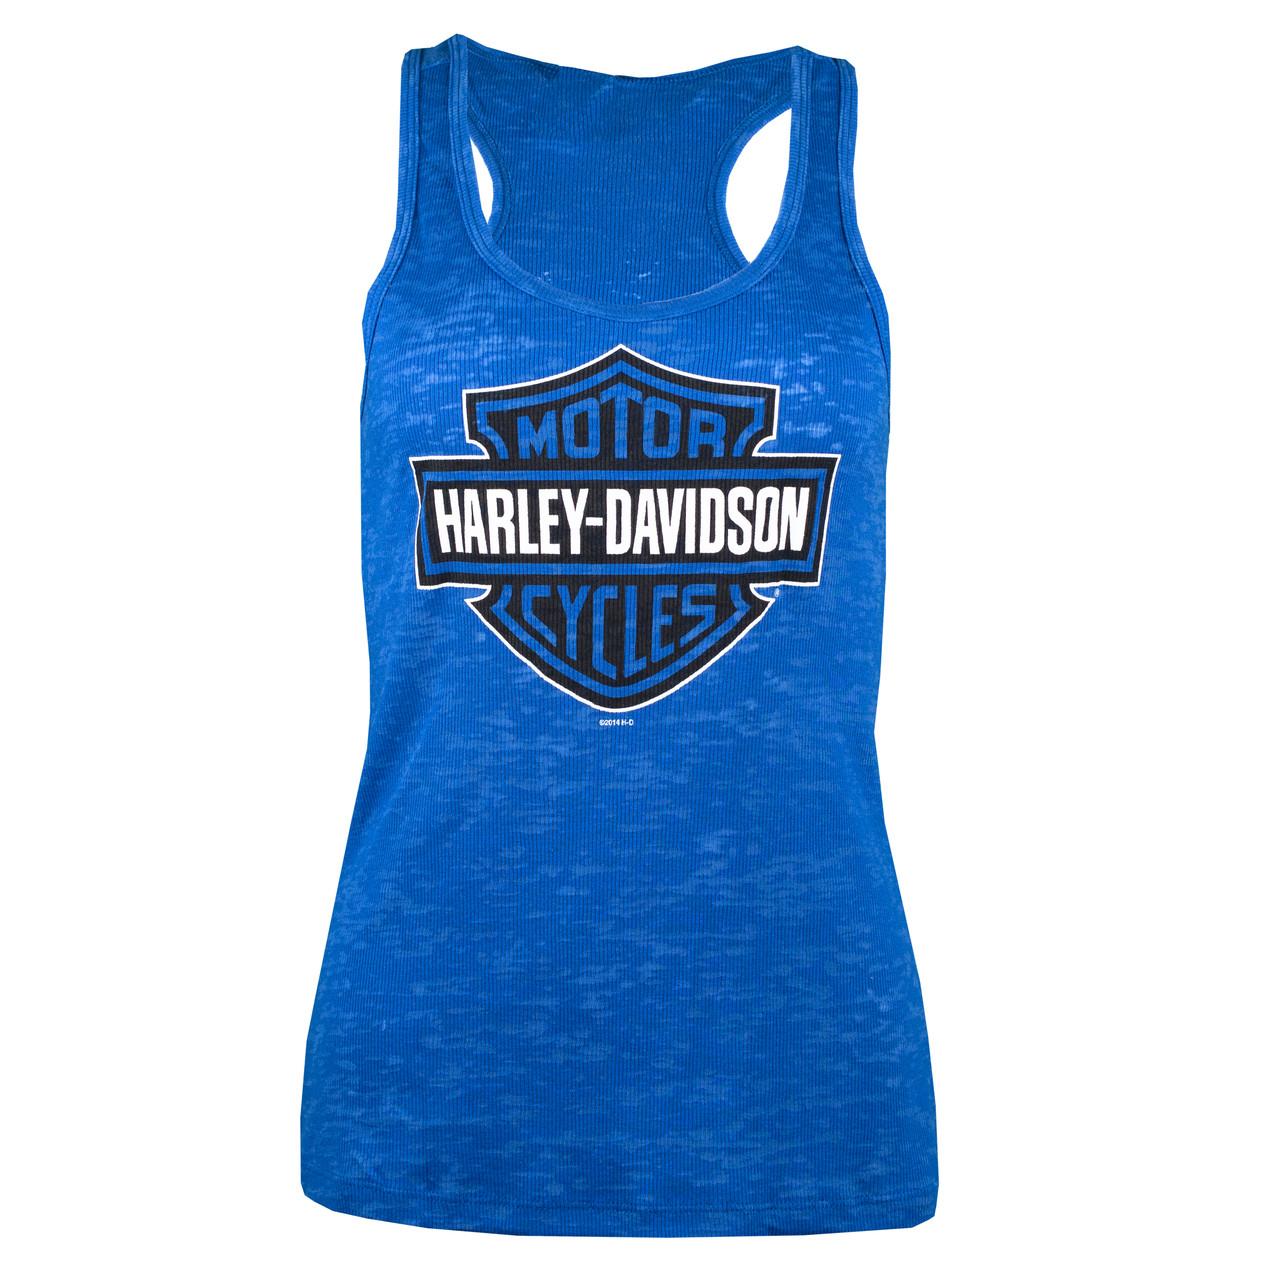 1991 Sturgis Harley Davidson Women/'s Tank Top XL